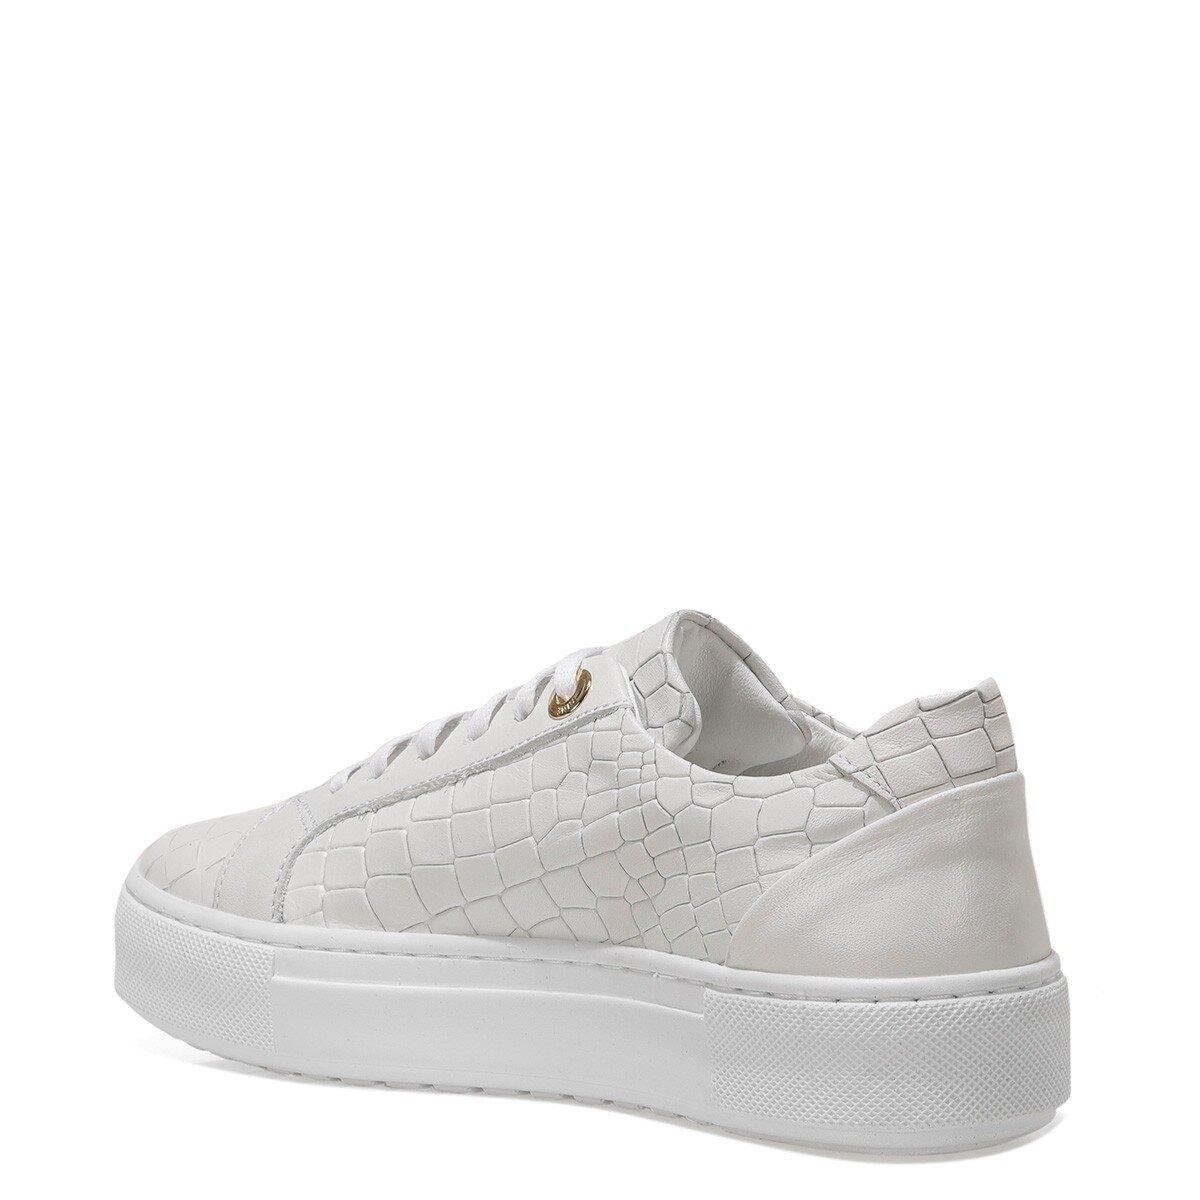 DREAMMORE 1FX Beyaz Kadın Sneaker